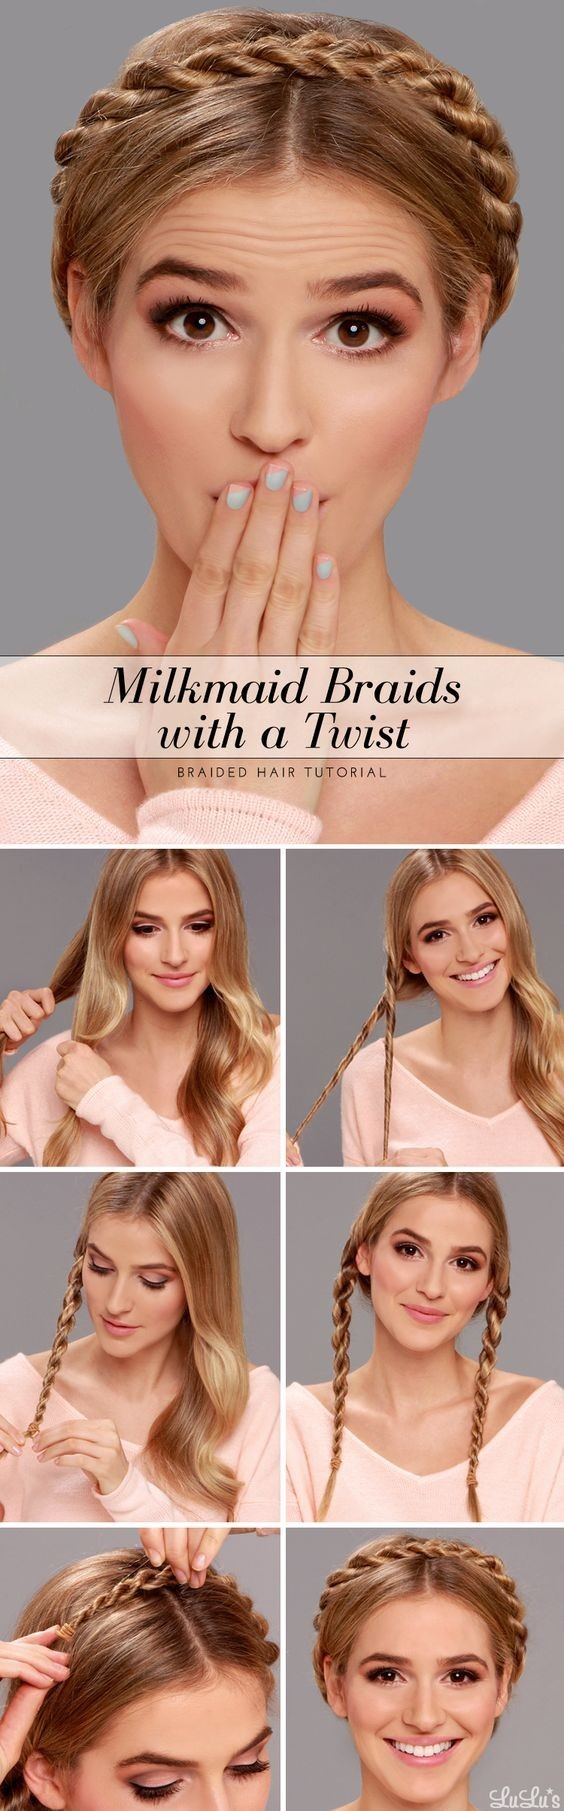 Milkmaid Braid Hair Styles with a Twist Hair Tutorial